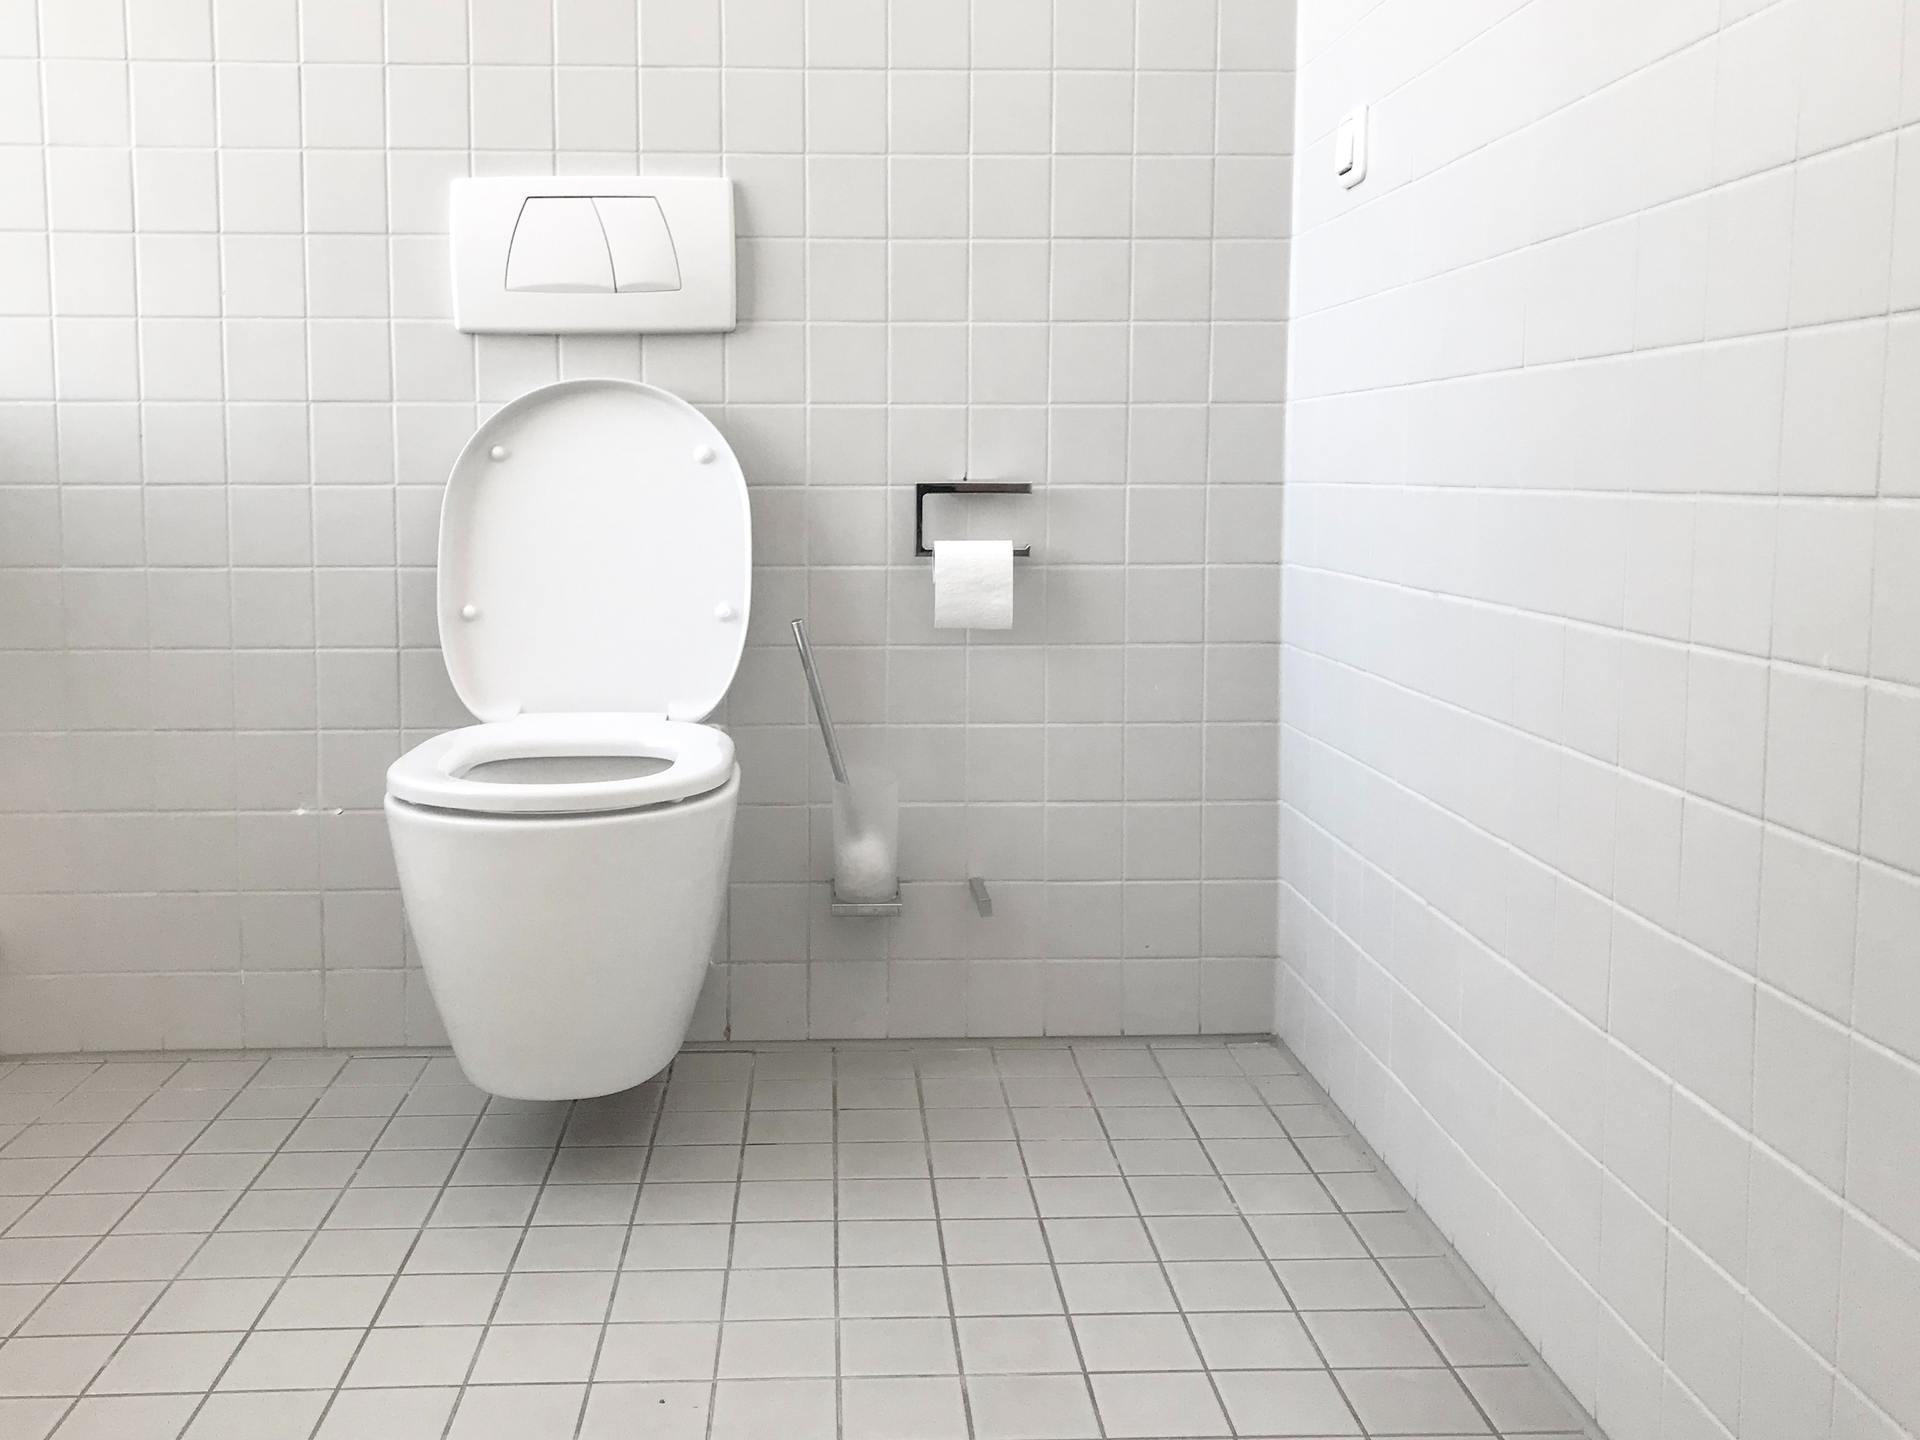 sharing a bathroom during coronavirus